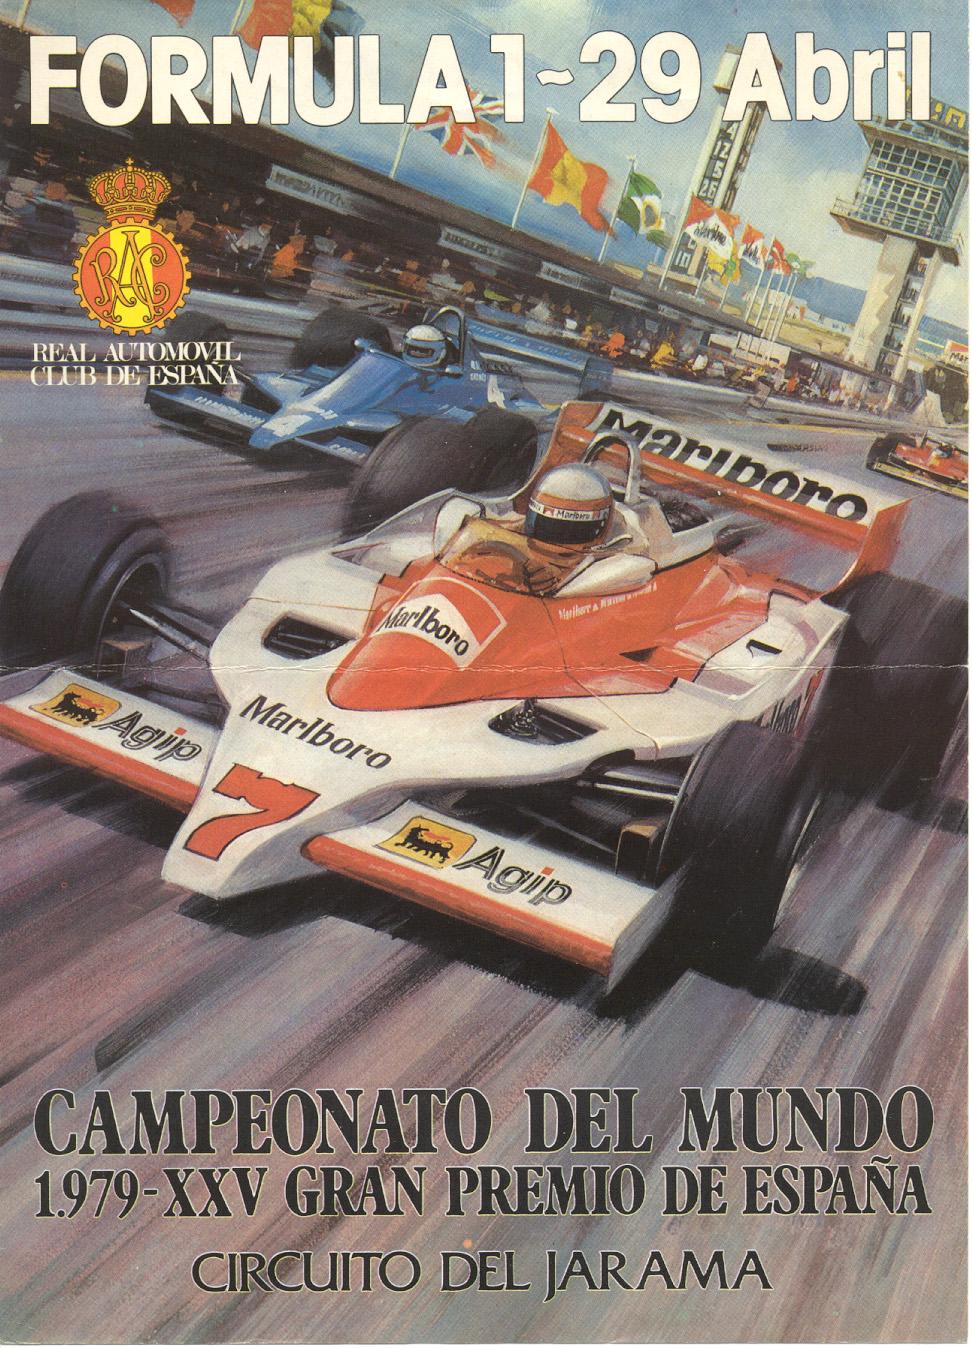 Circuito del Jarama Tour - 1979 Cartel